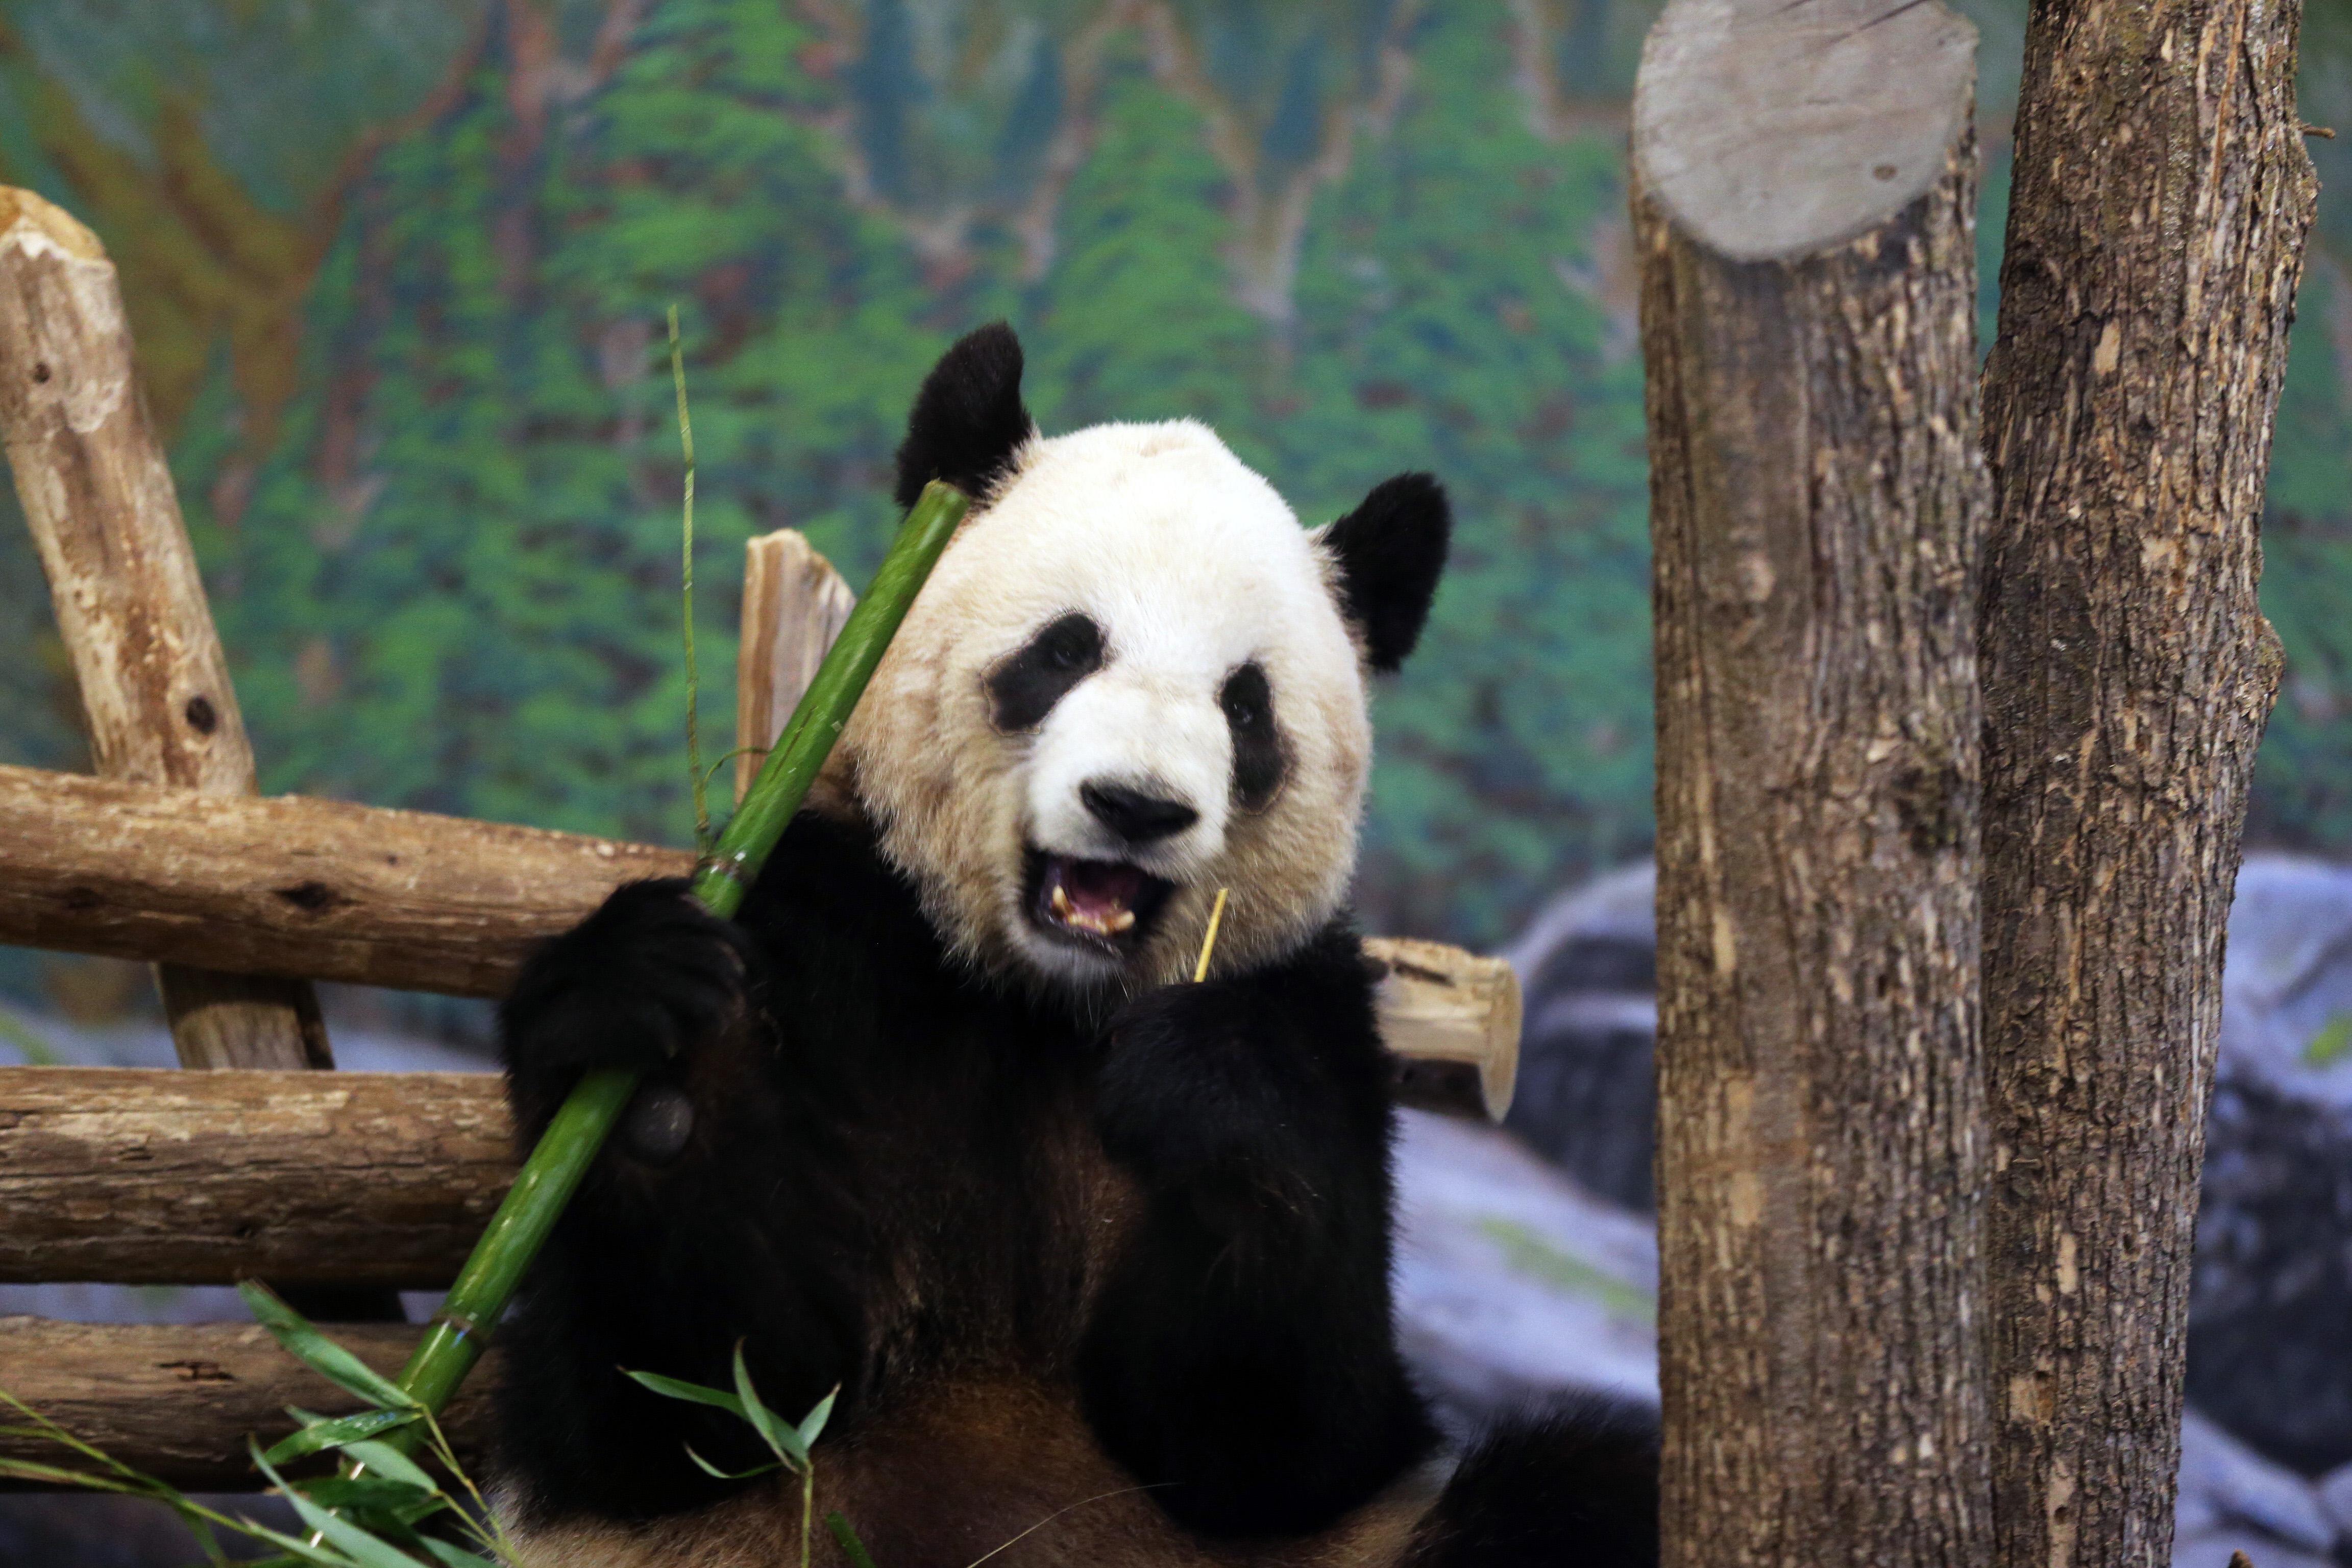 Panda Er Shun at the Toronto Zoo on April 29, 2014.